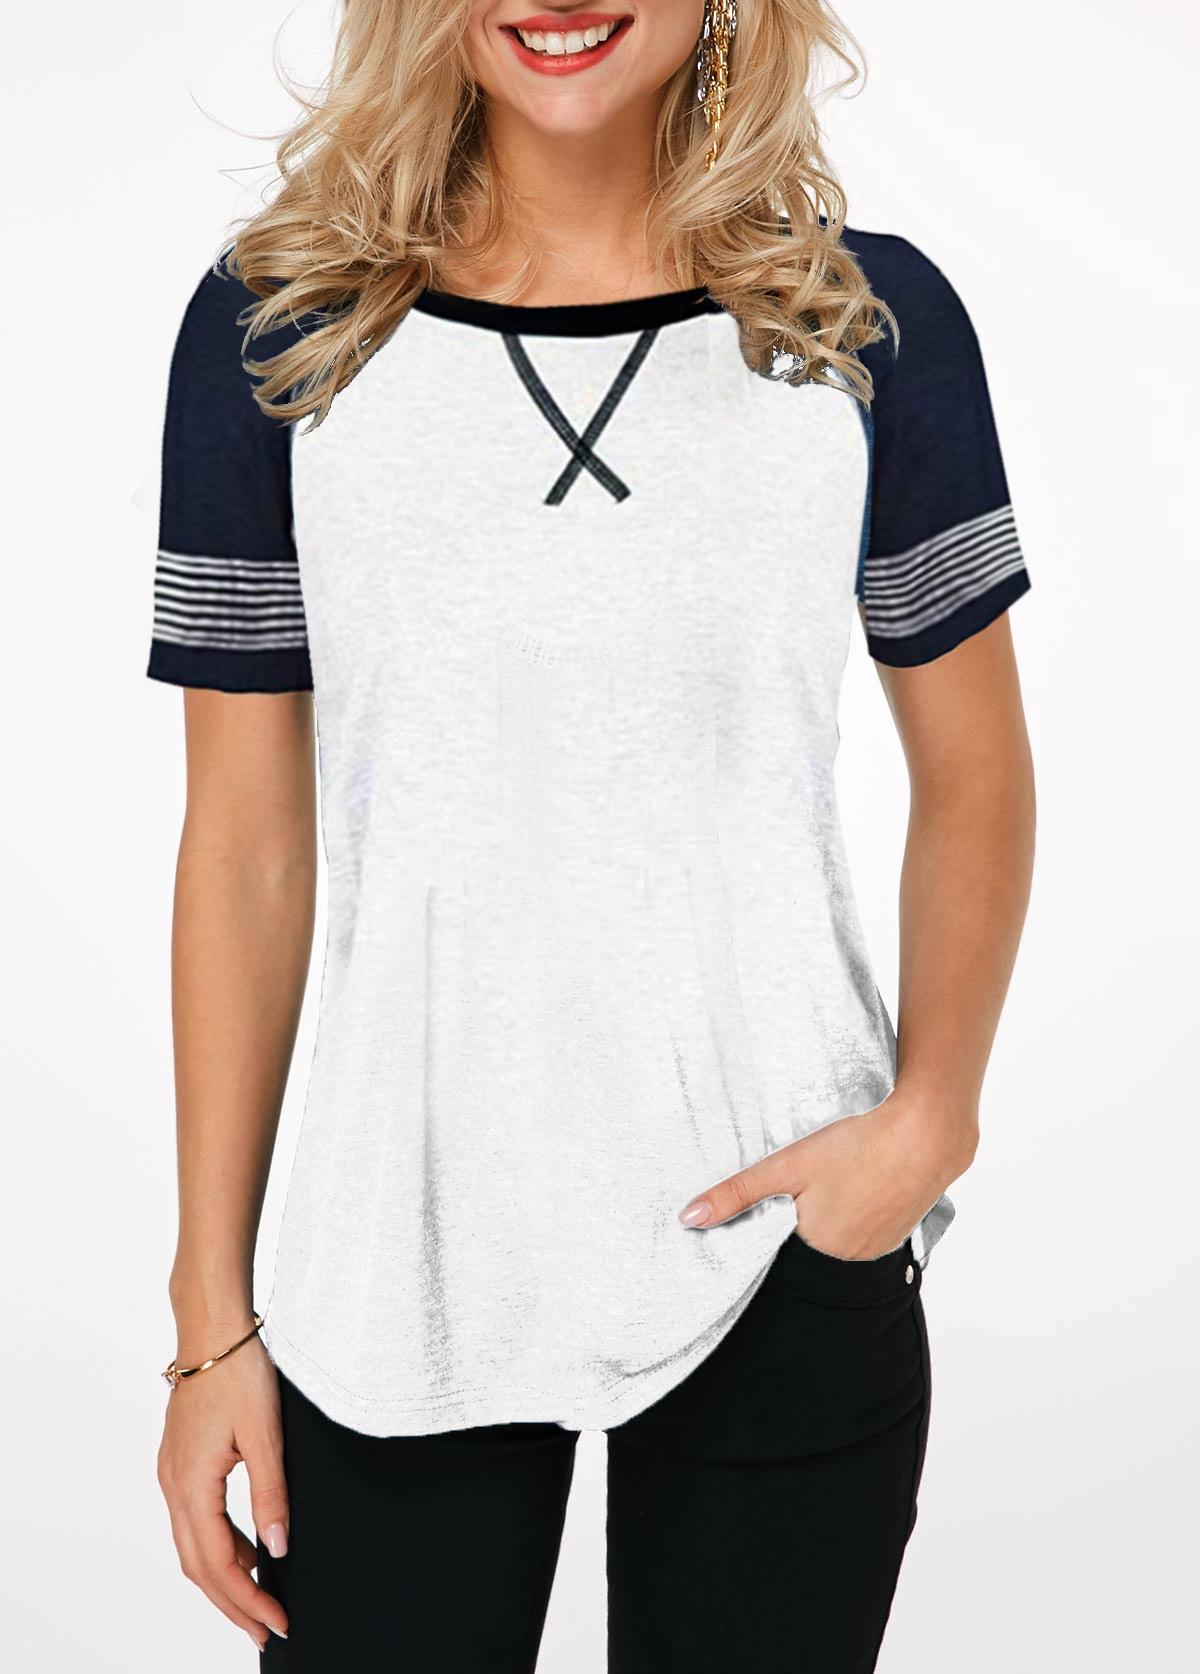 Round Neck Contrast Short Sleeve T Shirt